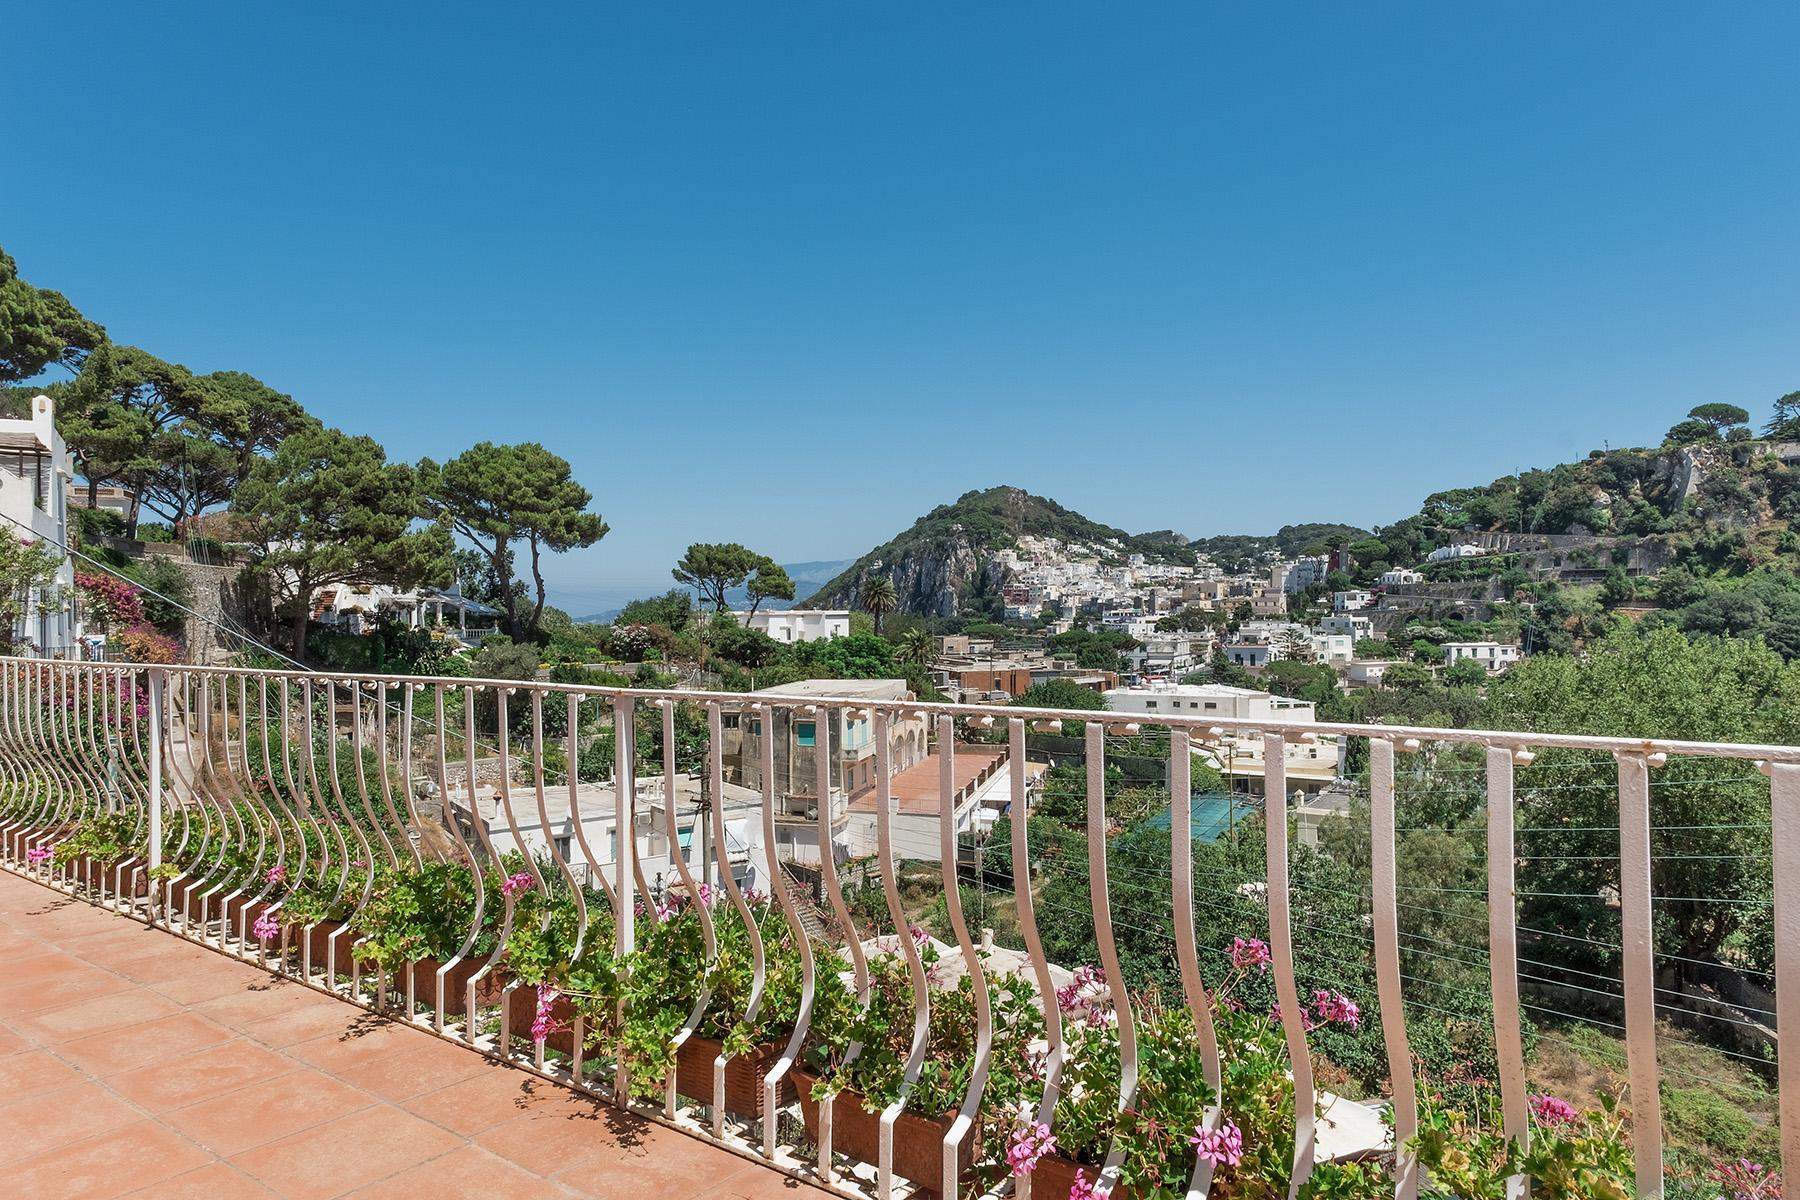 Прекрасная вилла с панорамным видом на море в центре легендарного острова Капри, Италия - 16